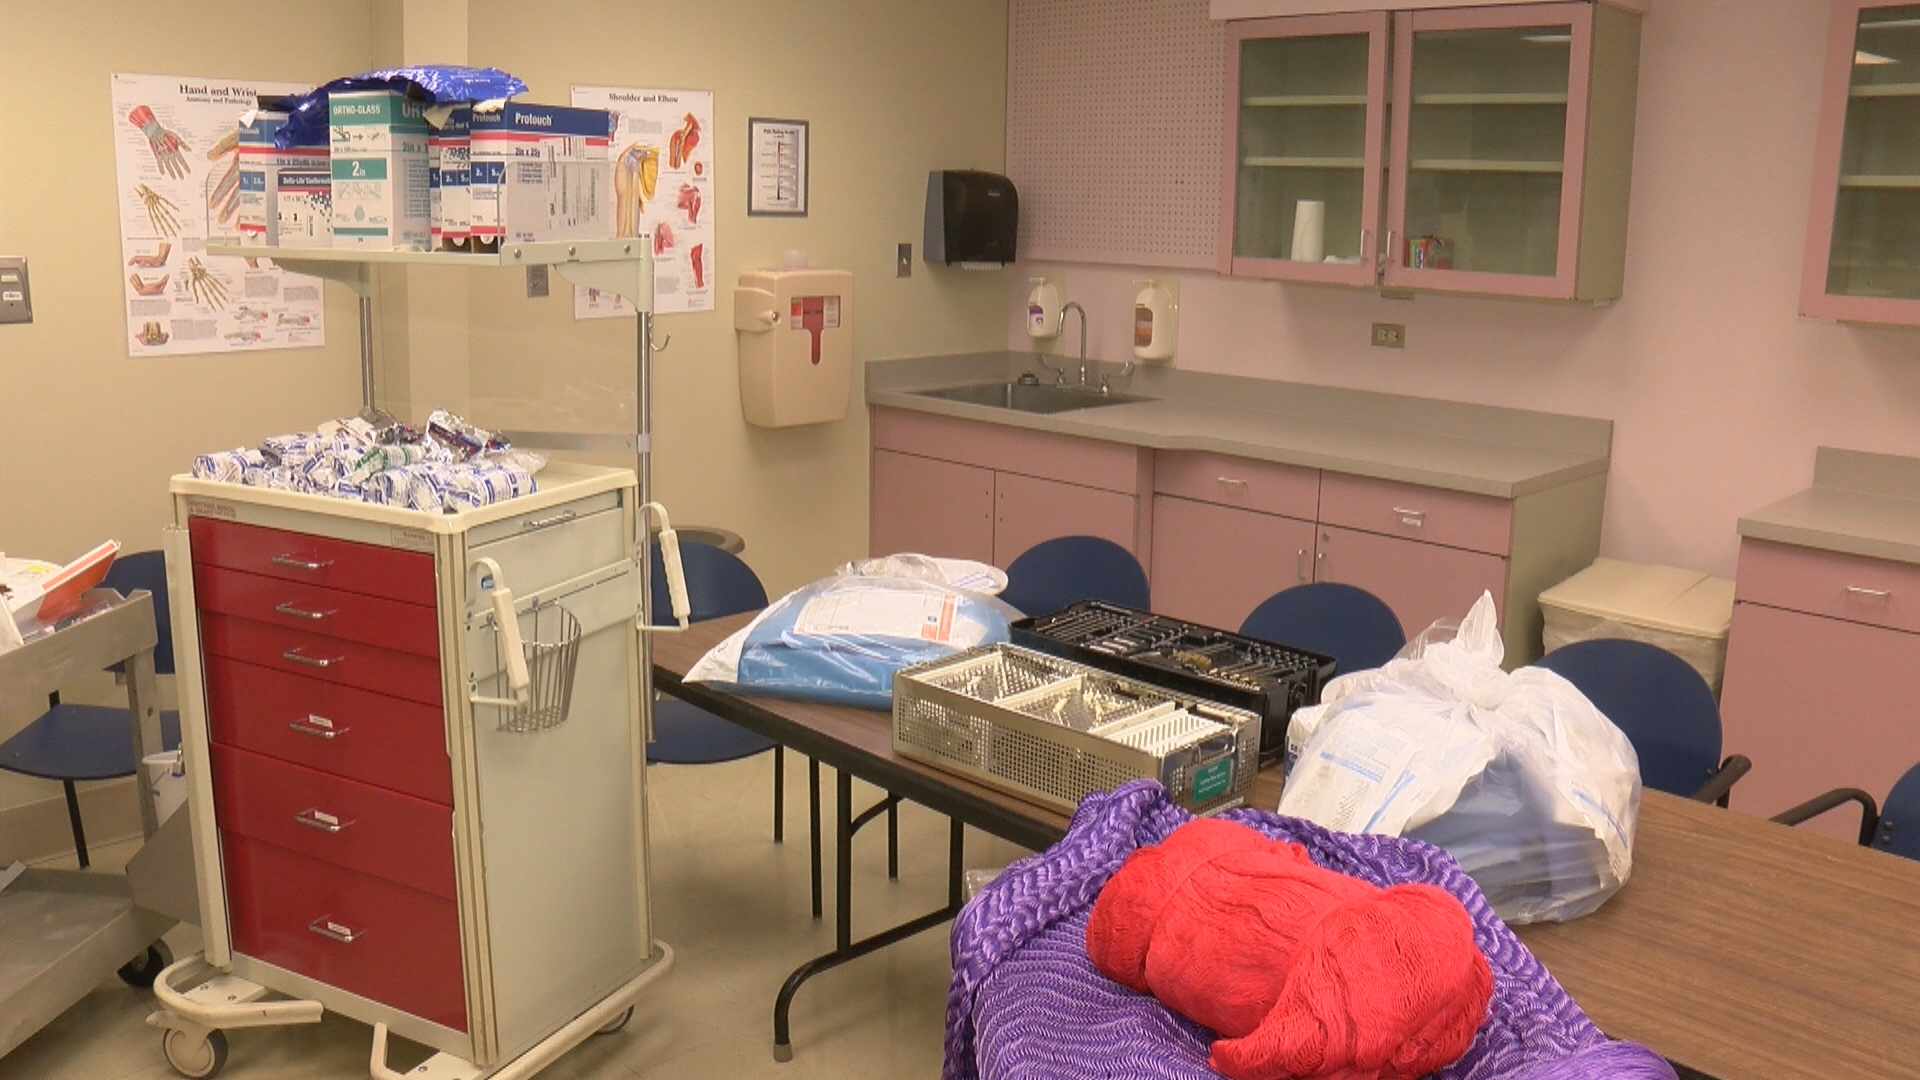 UPMC Hamot Orthopedic Staff Hopes to Help Hundreds in Mexico